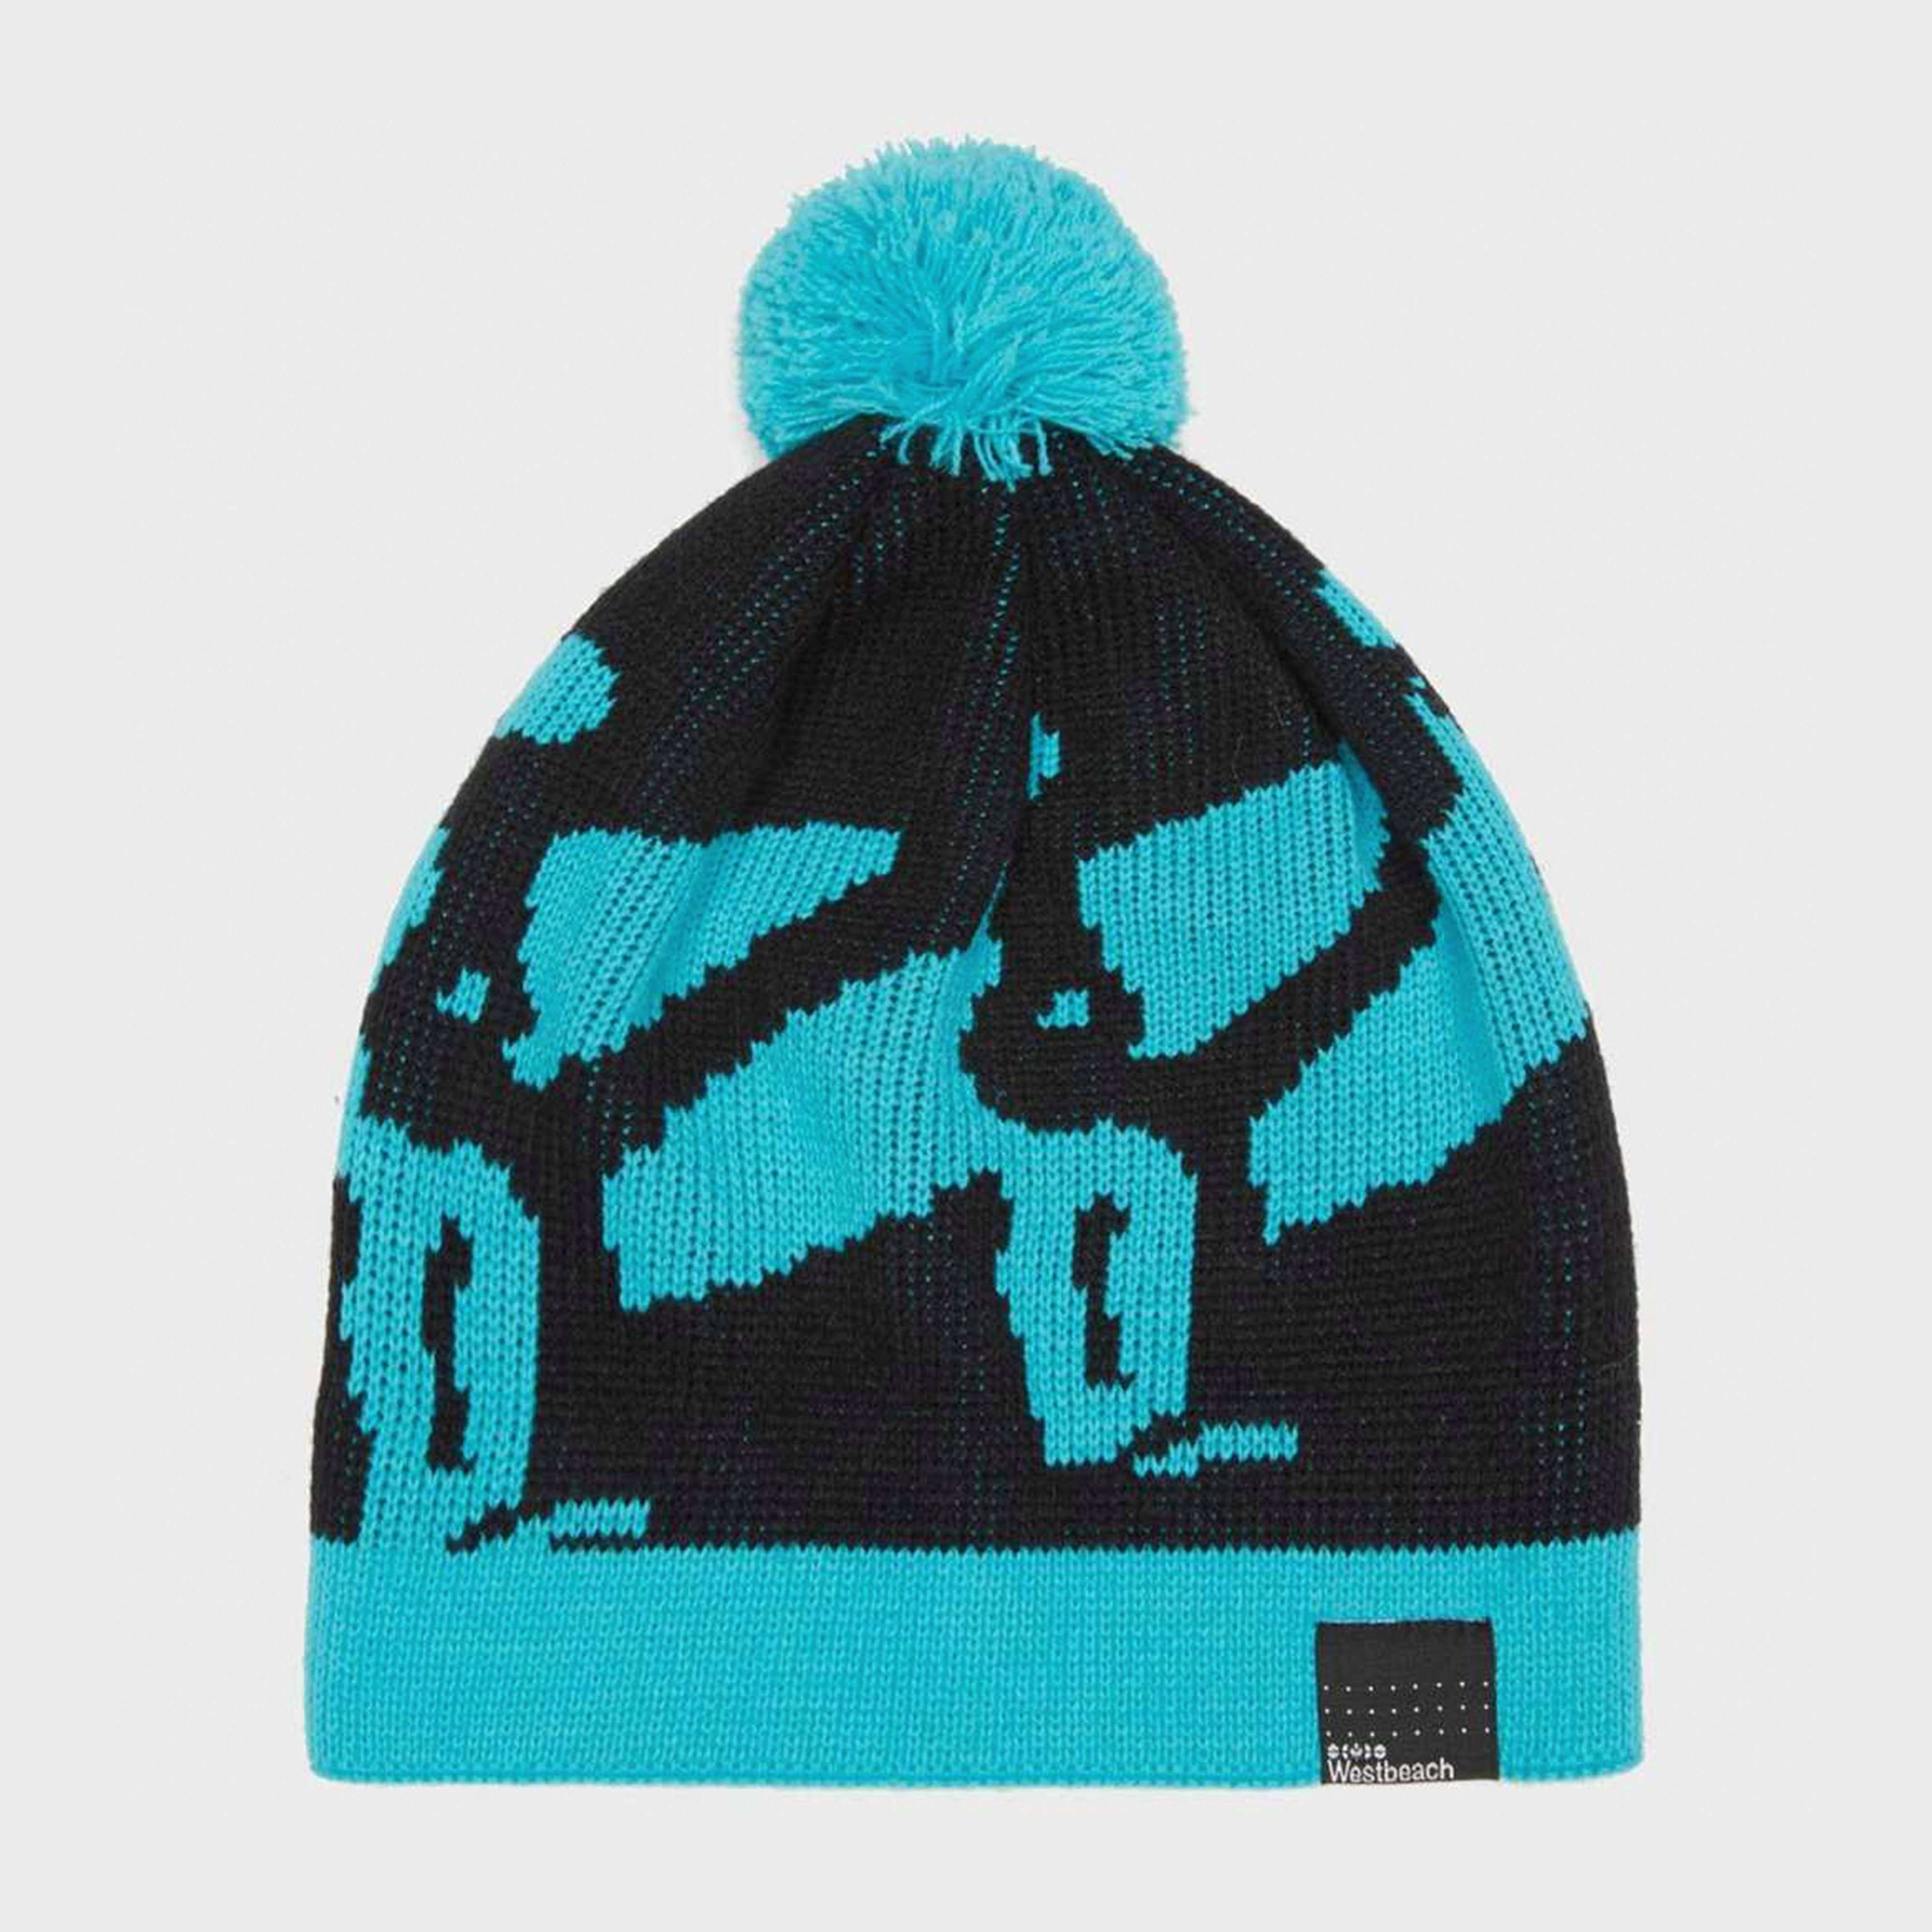 WESTBEACH Toque Beanie Hat